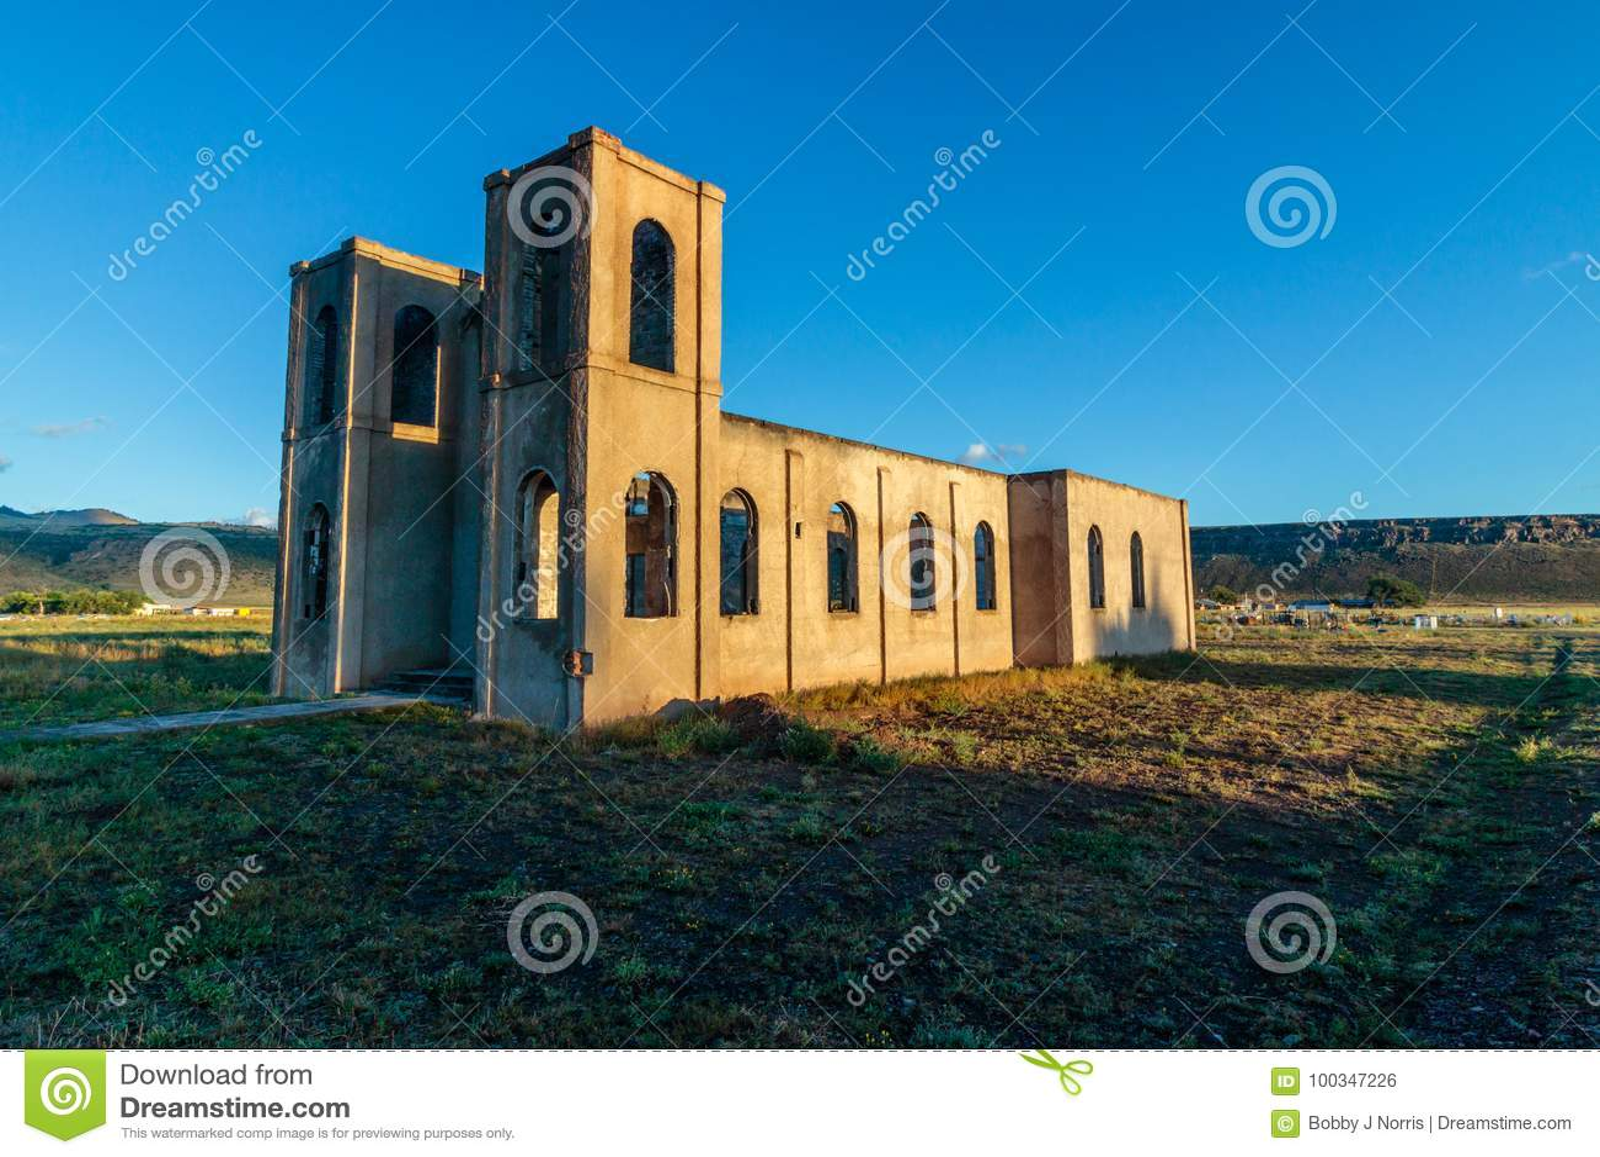 Old Church in Antonito Colorado